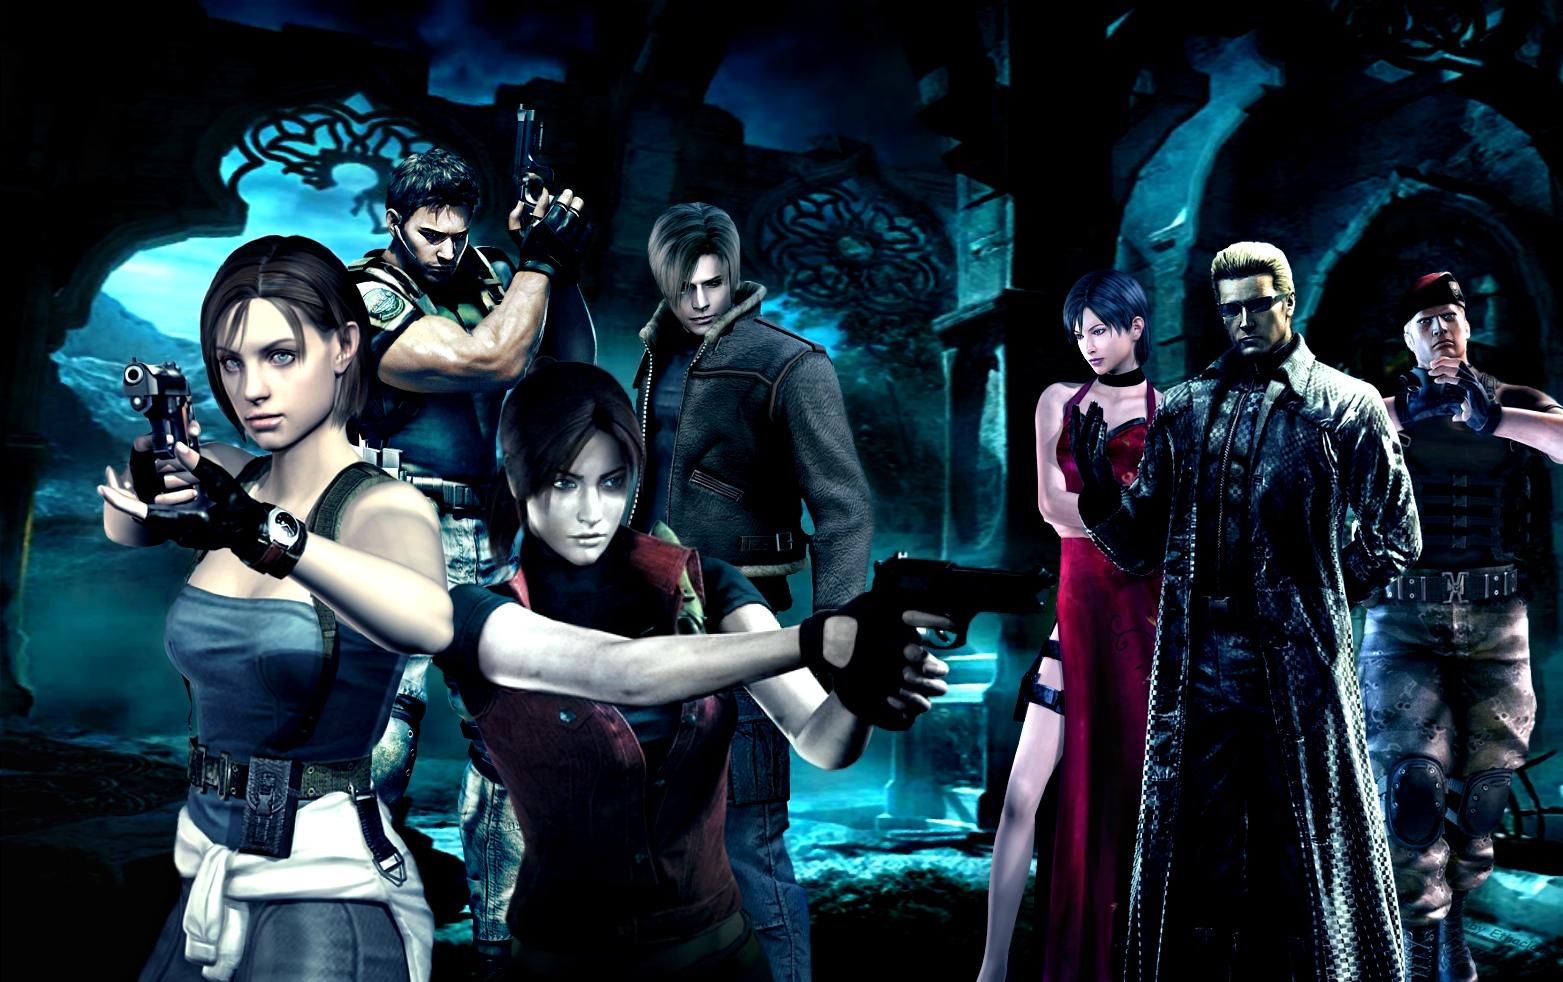 49 Resident Evil 7 Wallpapers On Wallpapersafari